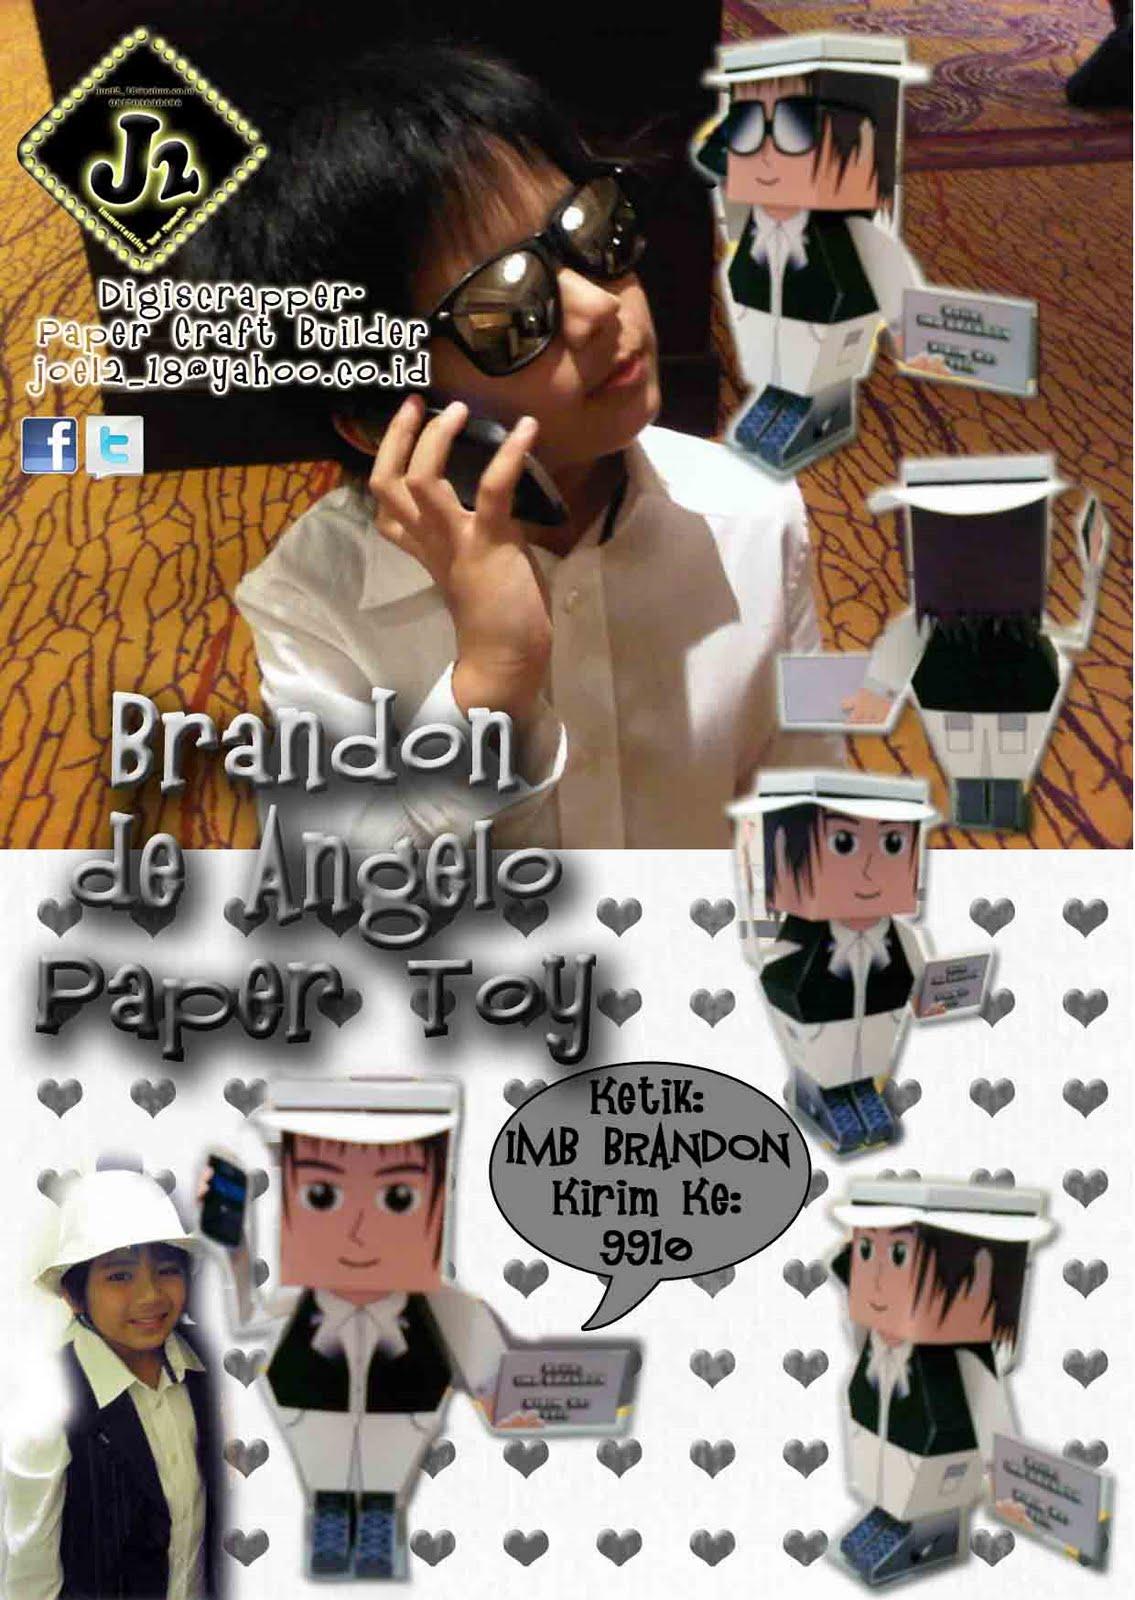 His Name Is Brandon De Angelo His Fans Always Scream When He Show His Dance Brandon S Photo Taken From His Fb